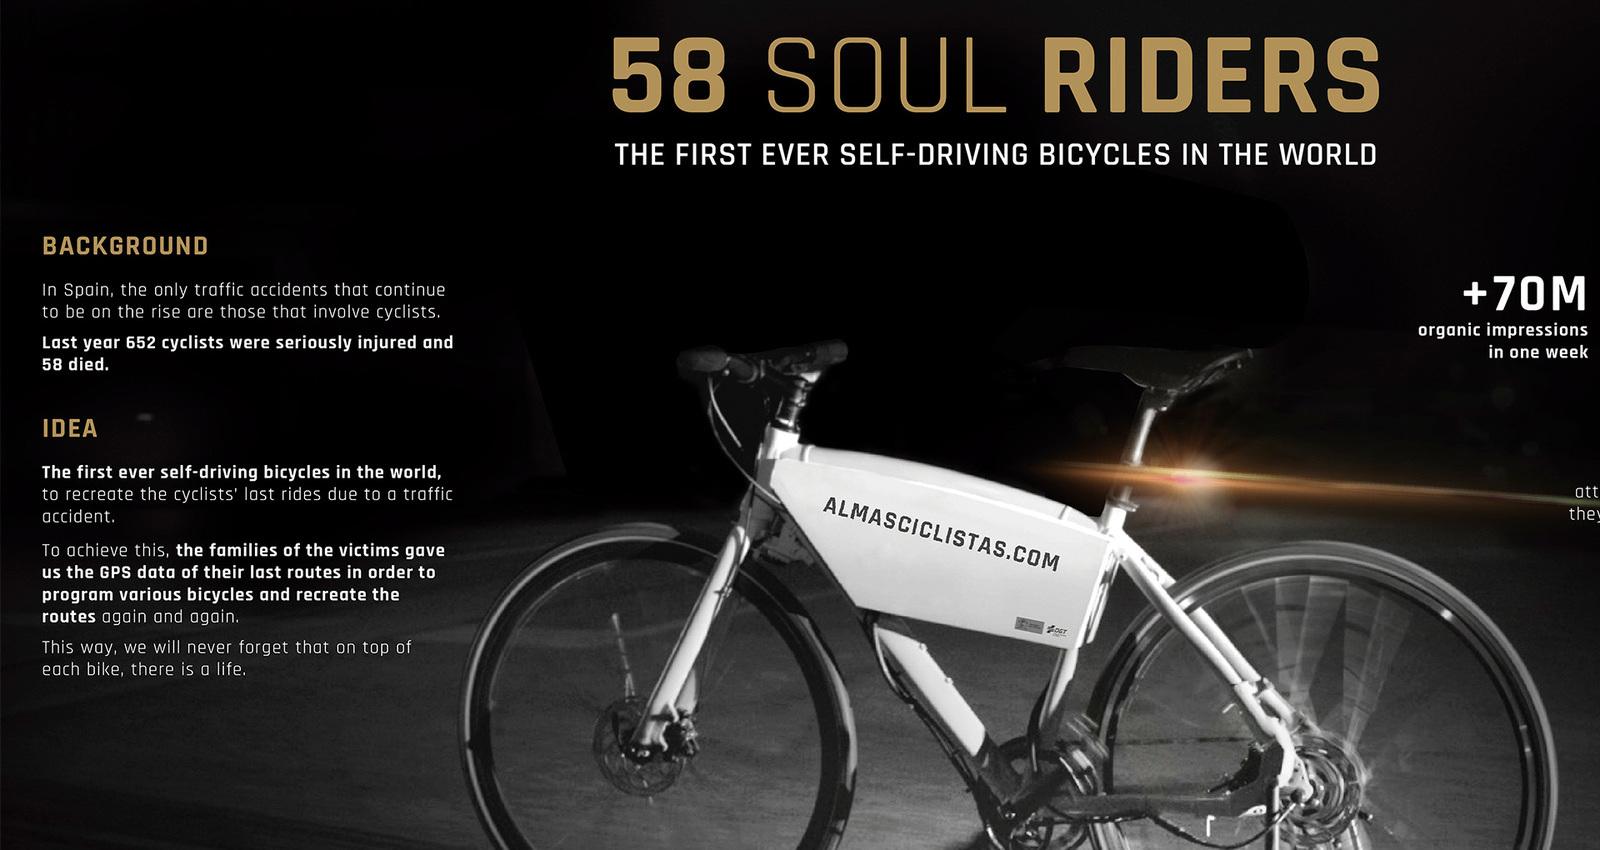 58 Soul Riders